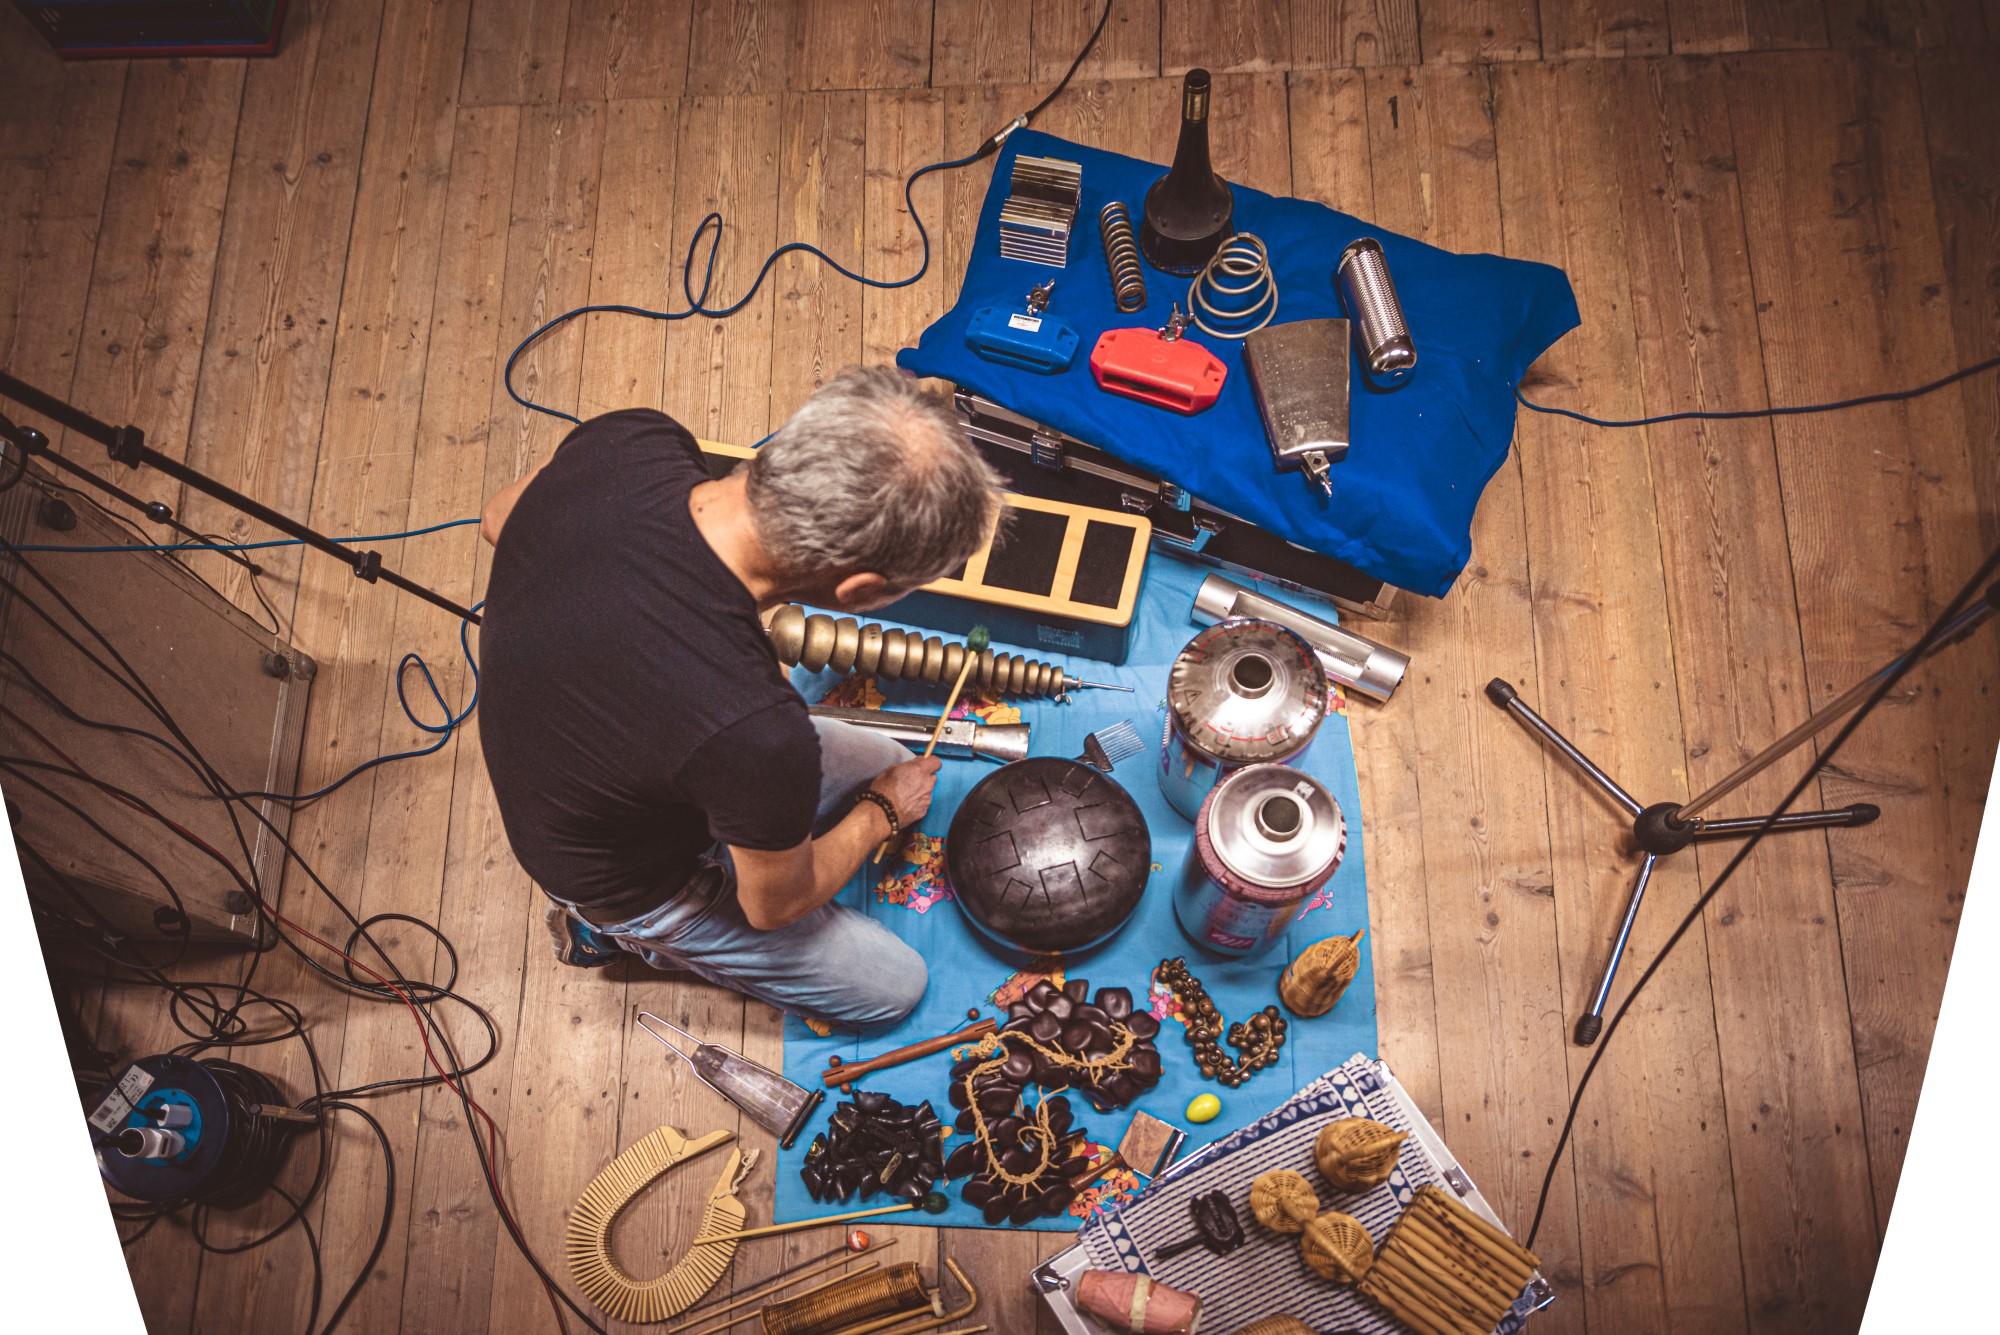 DSC 8721 - Loft and music